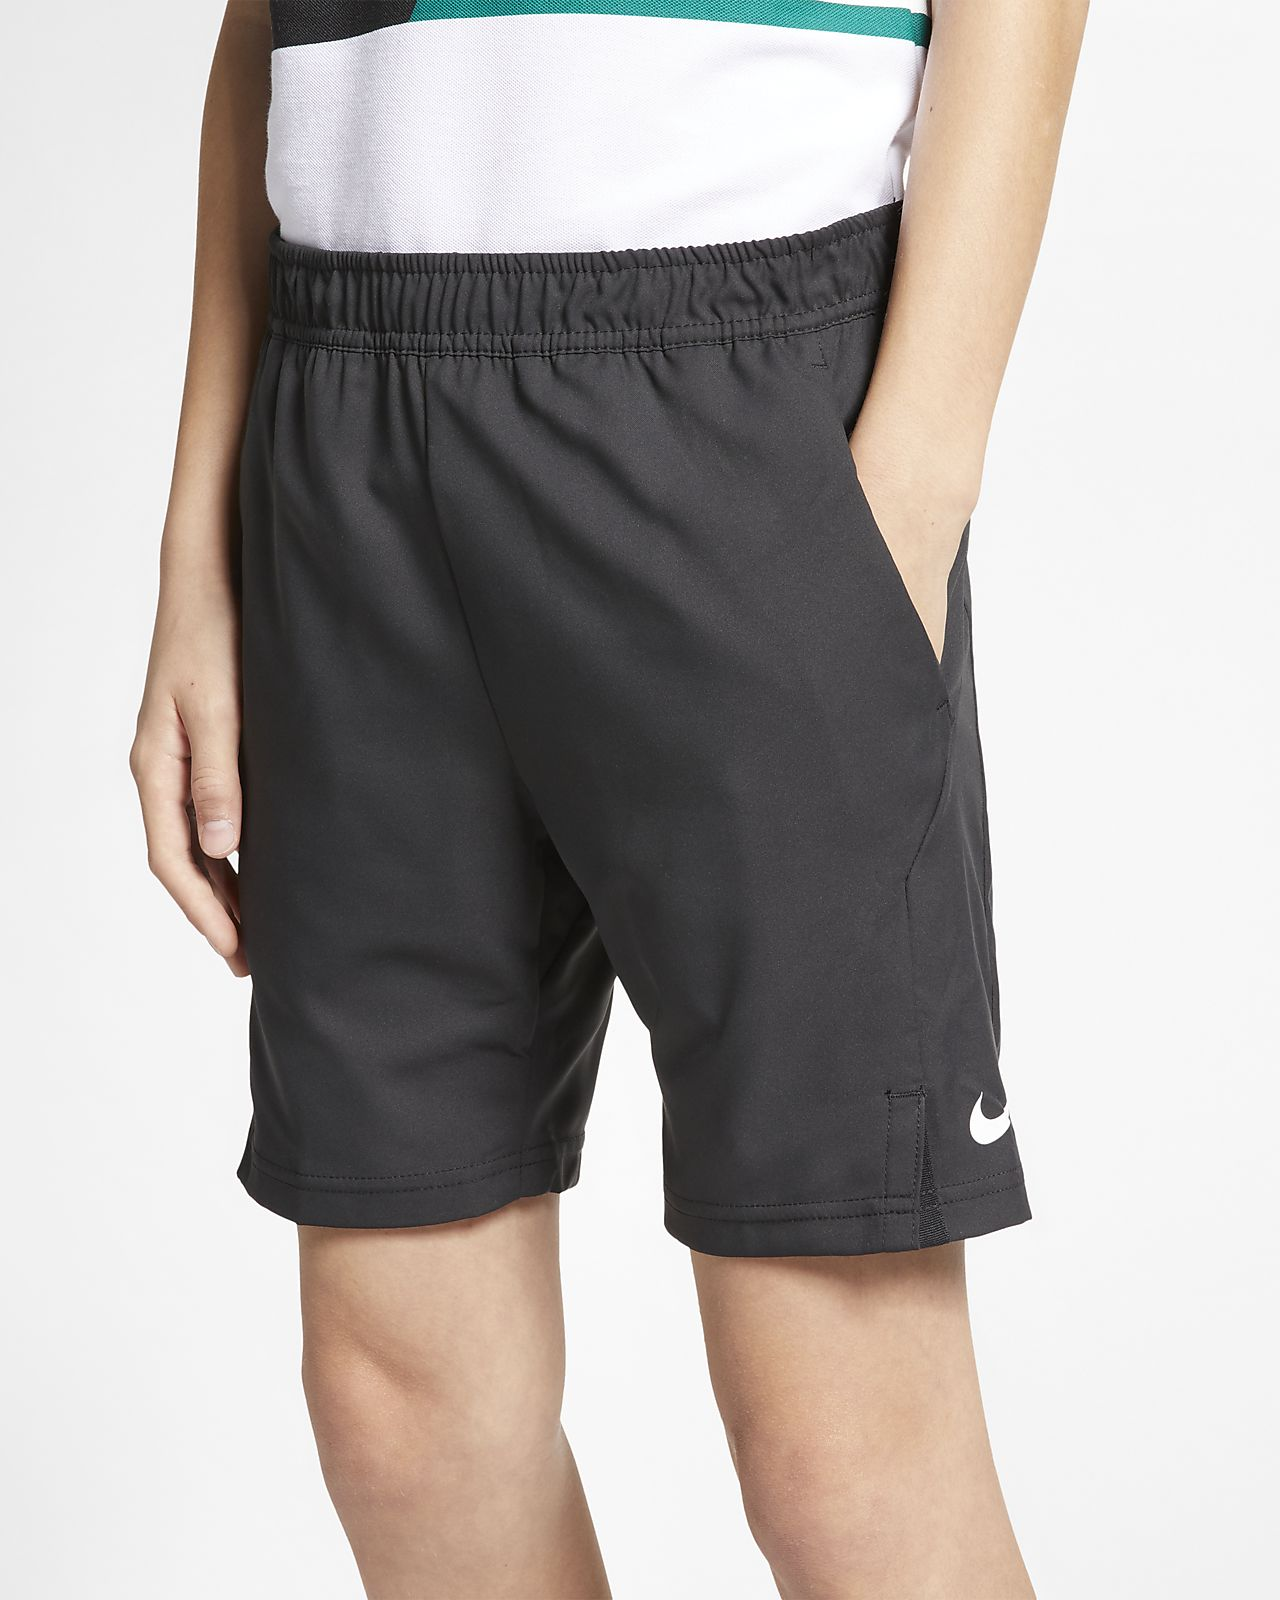 Tennisshorts NikeCourt Dri-FIT för killar